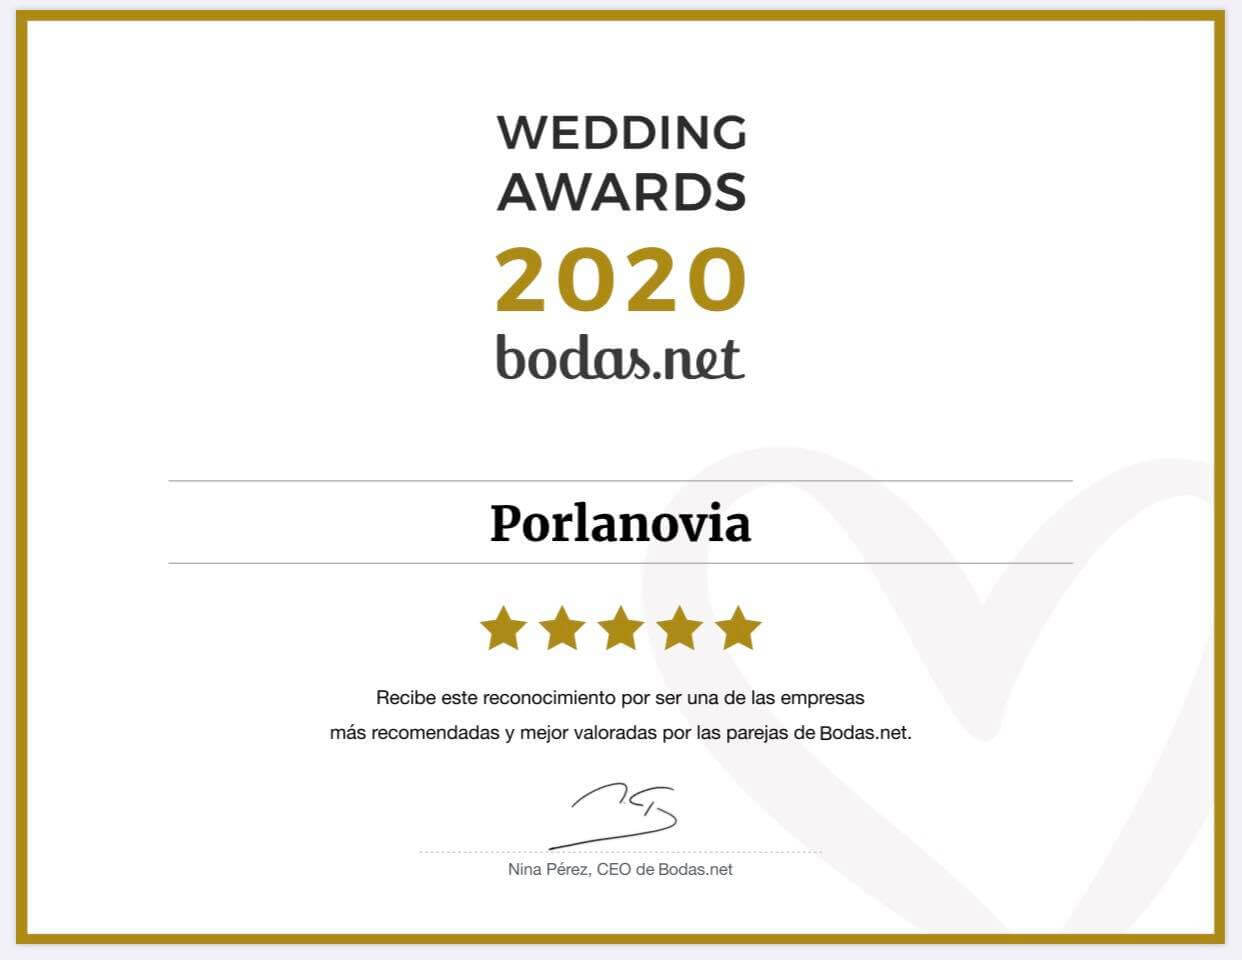 premio bodas net 2020